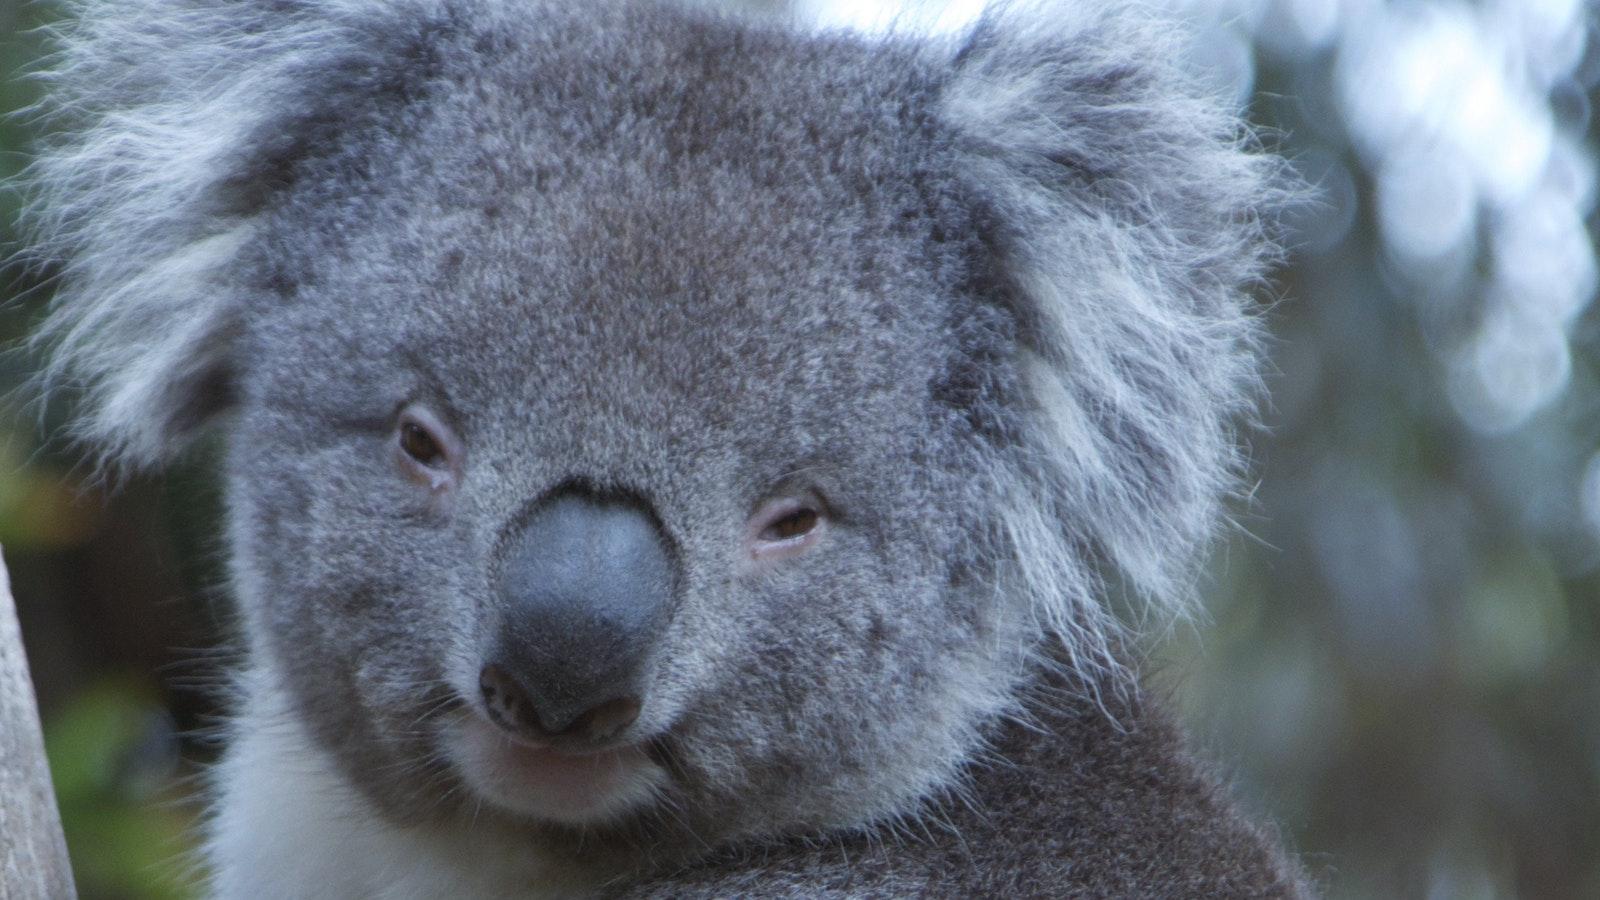 PJ the Koala